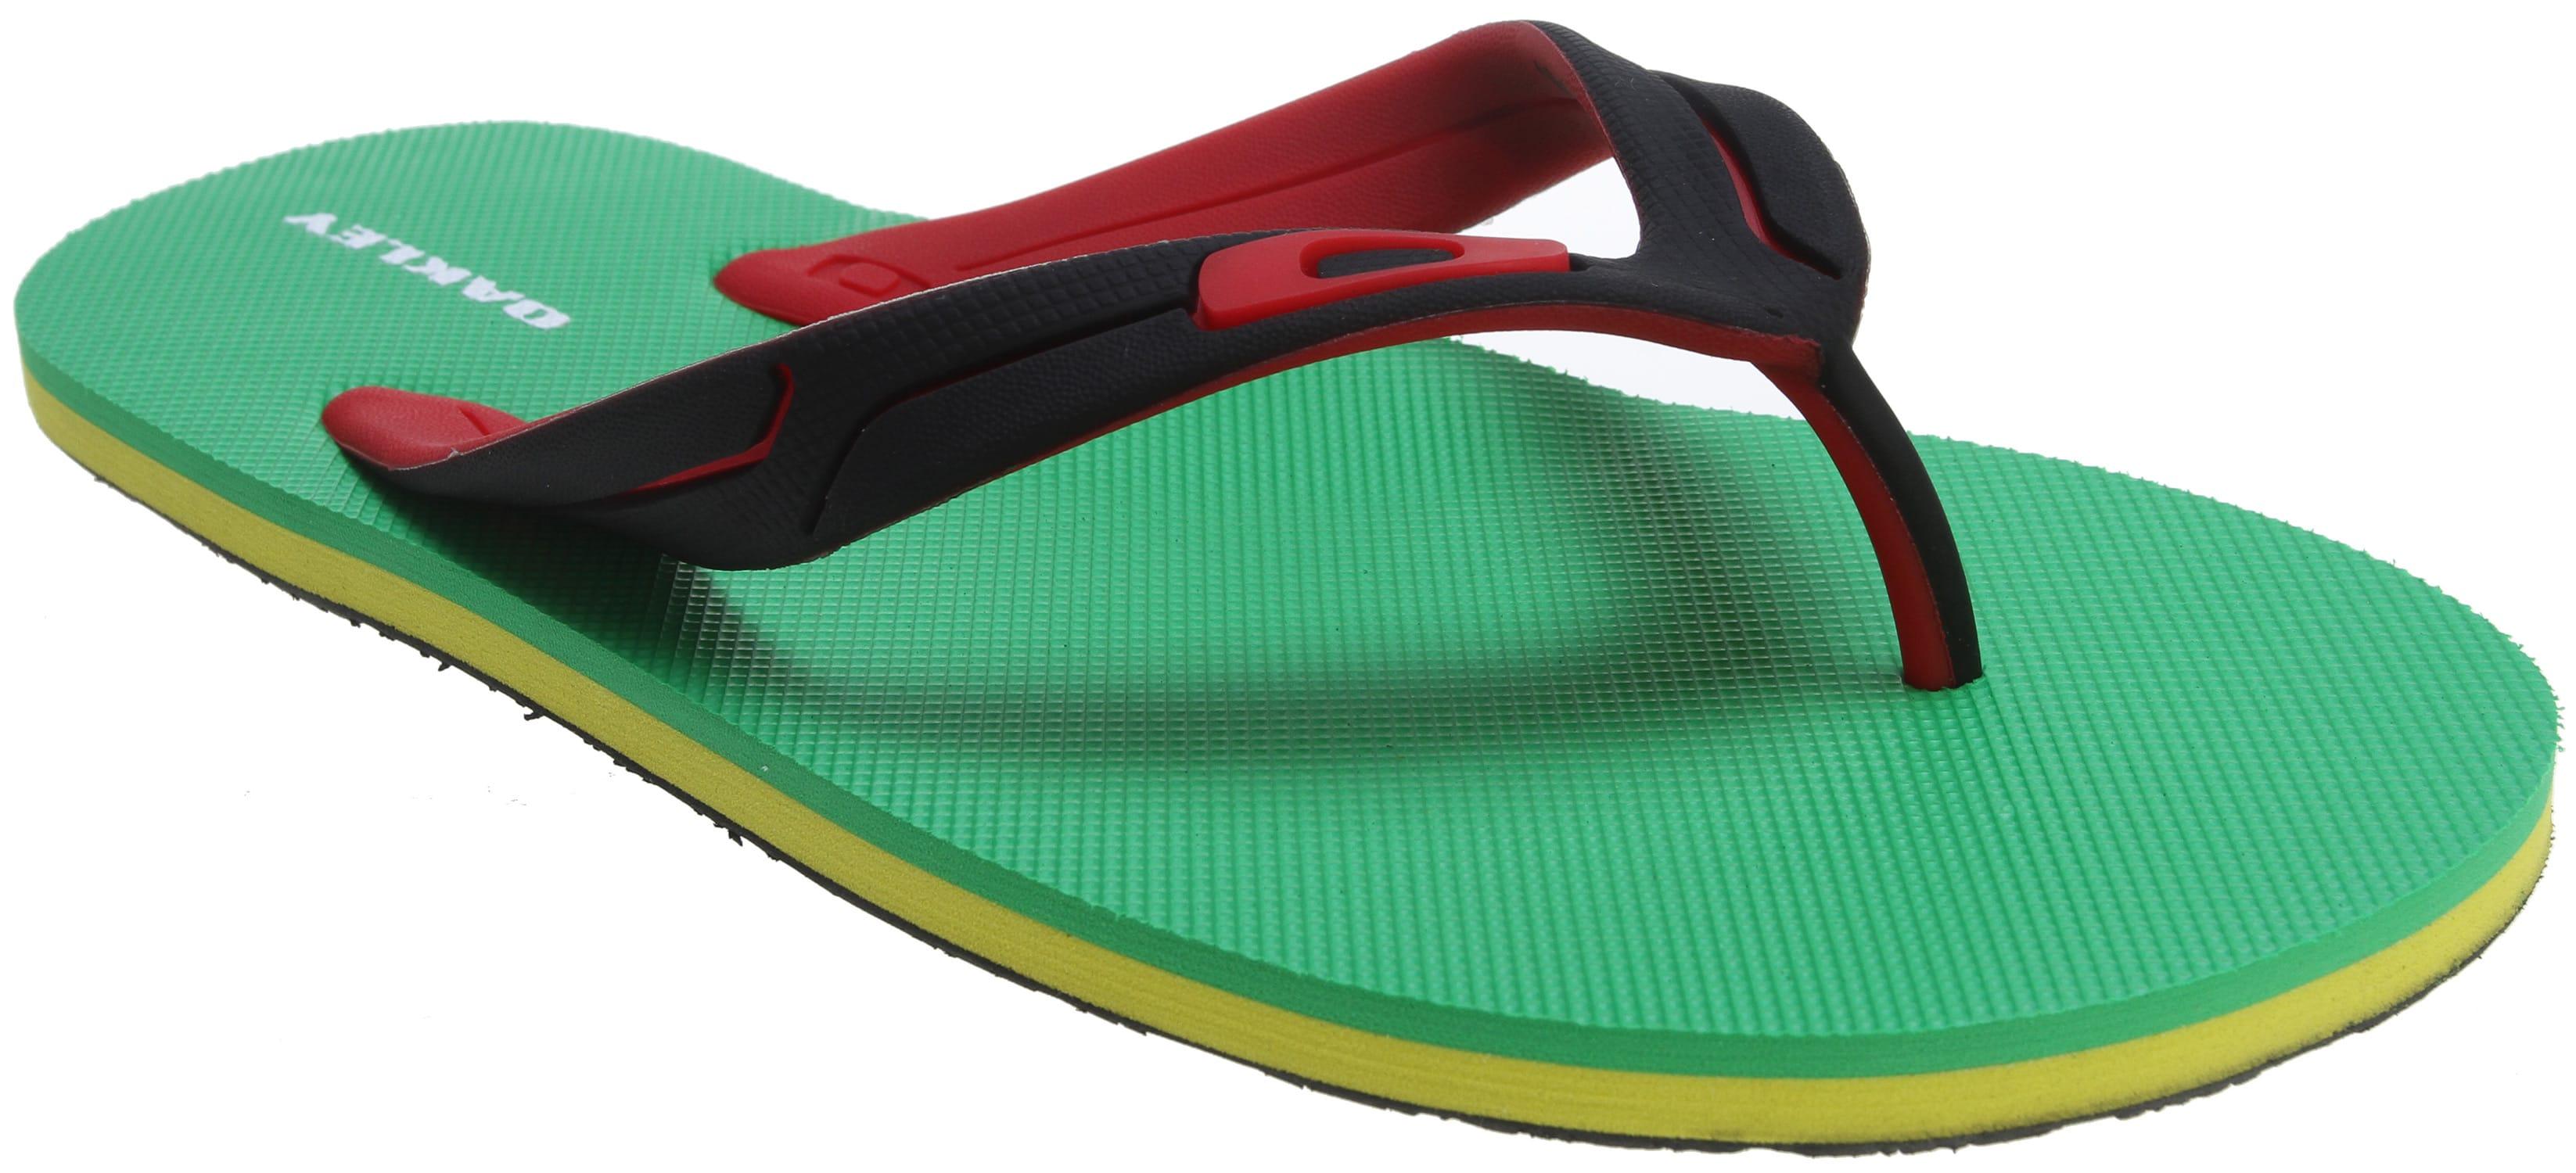 291ae3e4dcf Oakley Standard Sandals - thumbnail 2